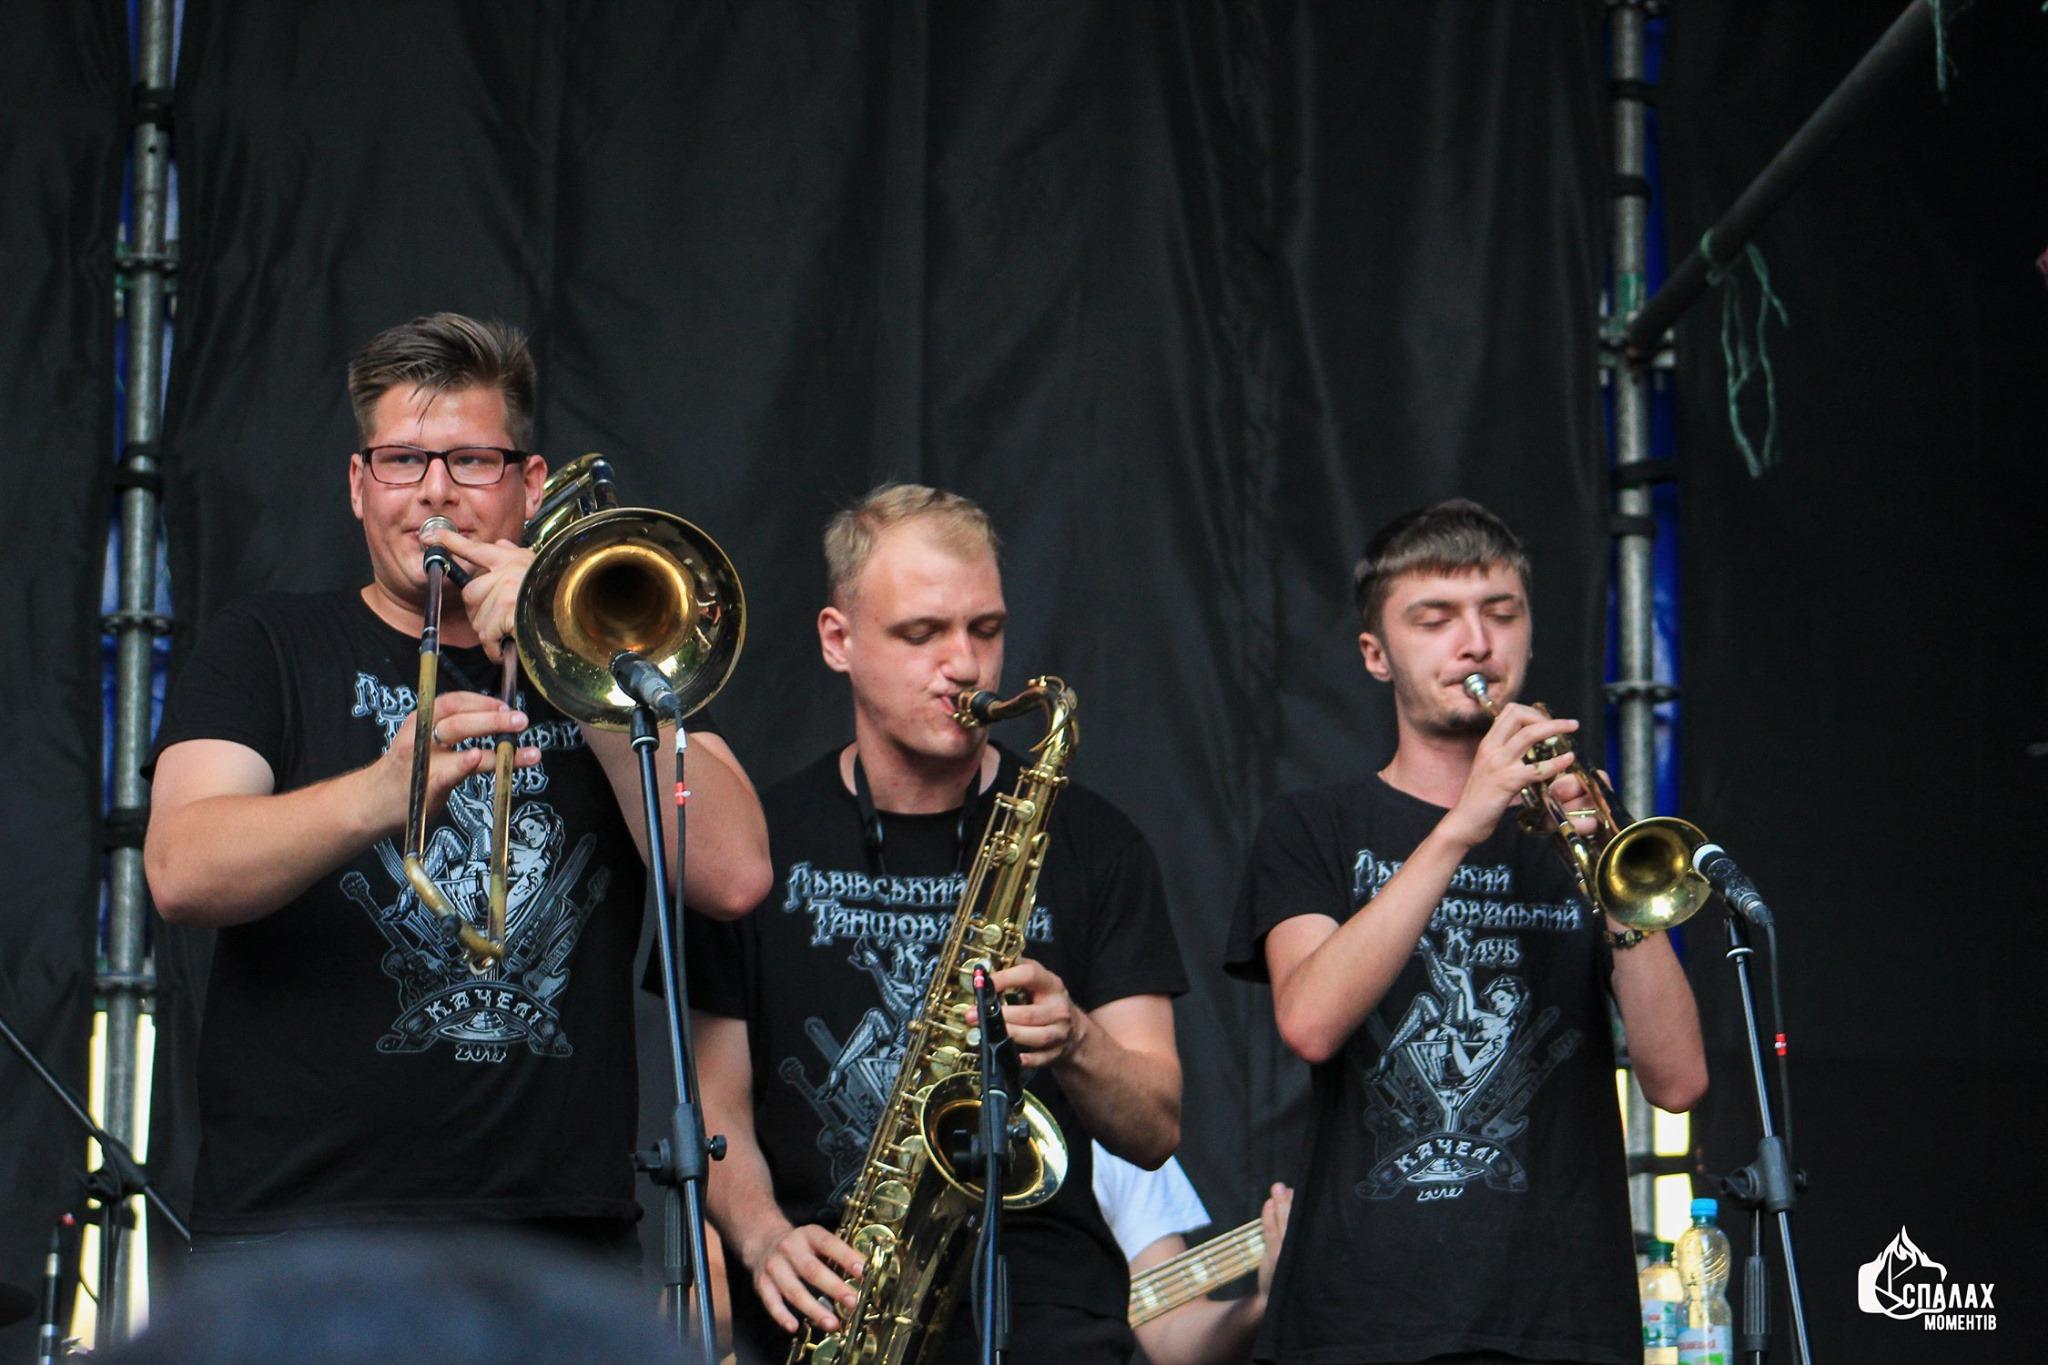 lvivdanceclub9 Lvivdanceclub — UA MUSIC | Енциклопедія української музики